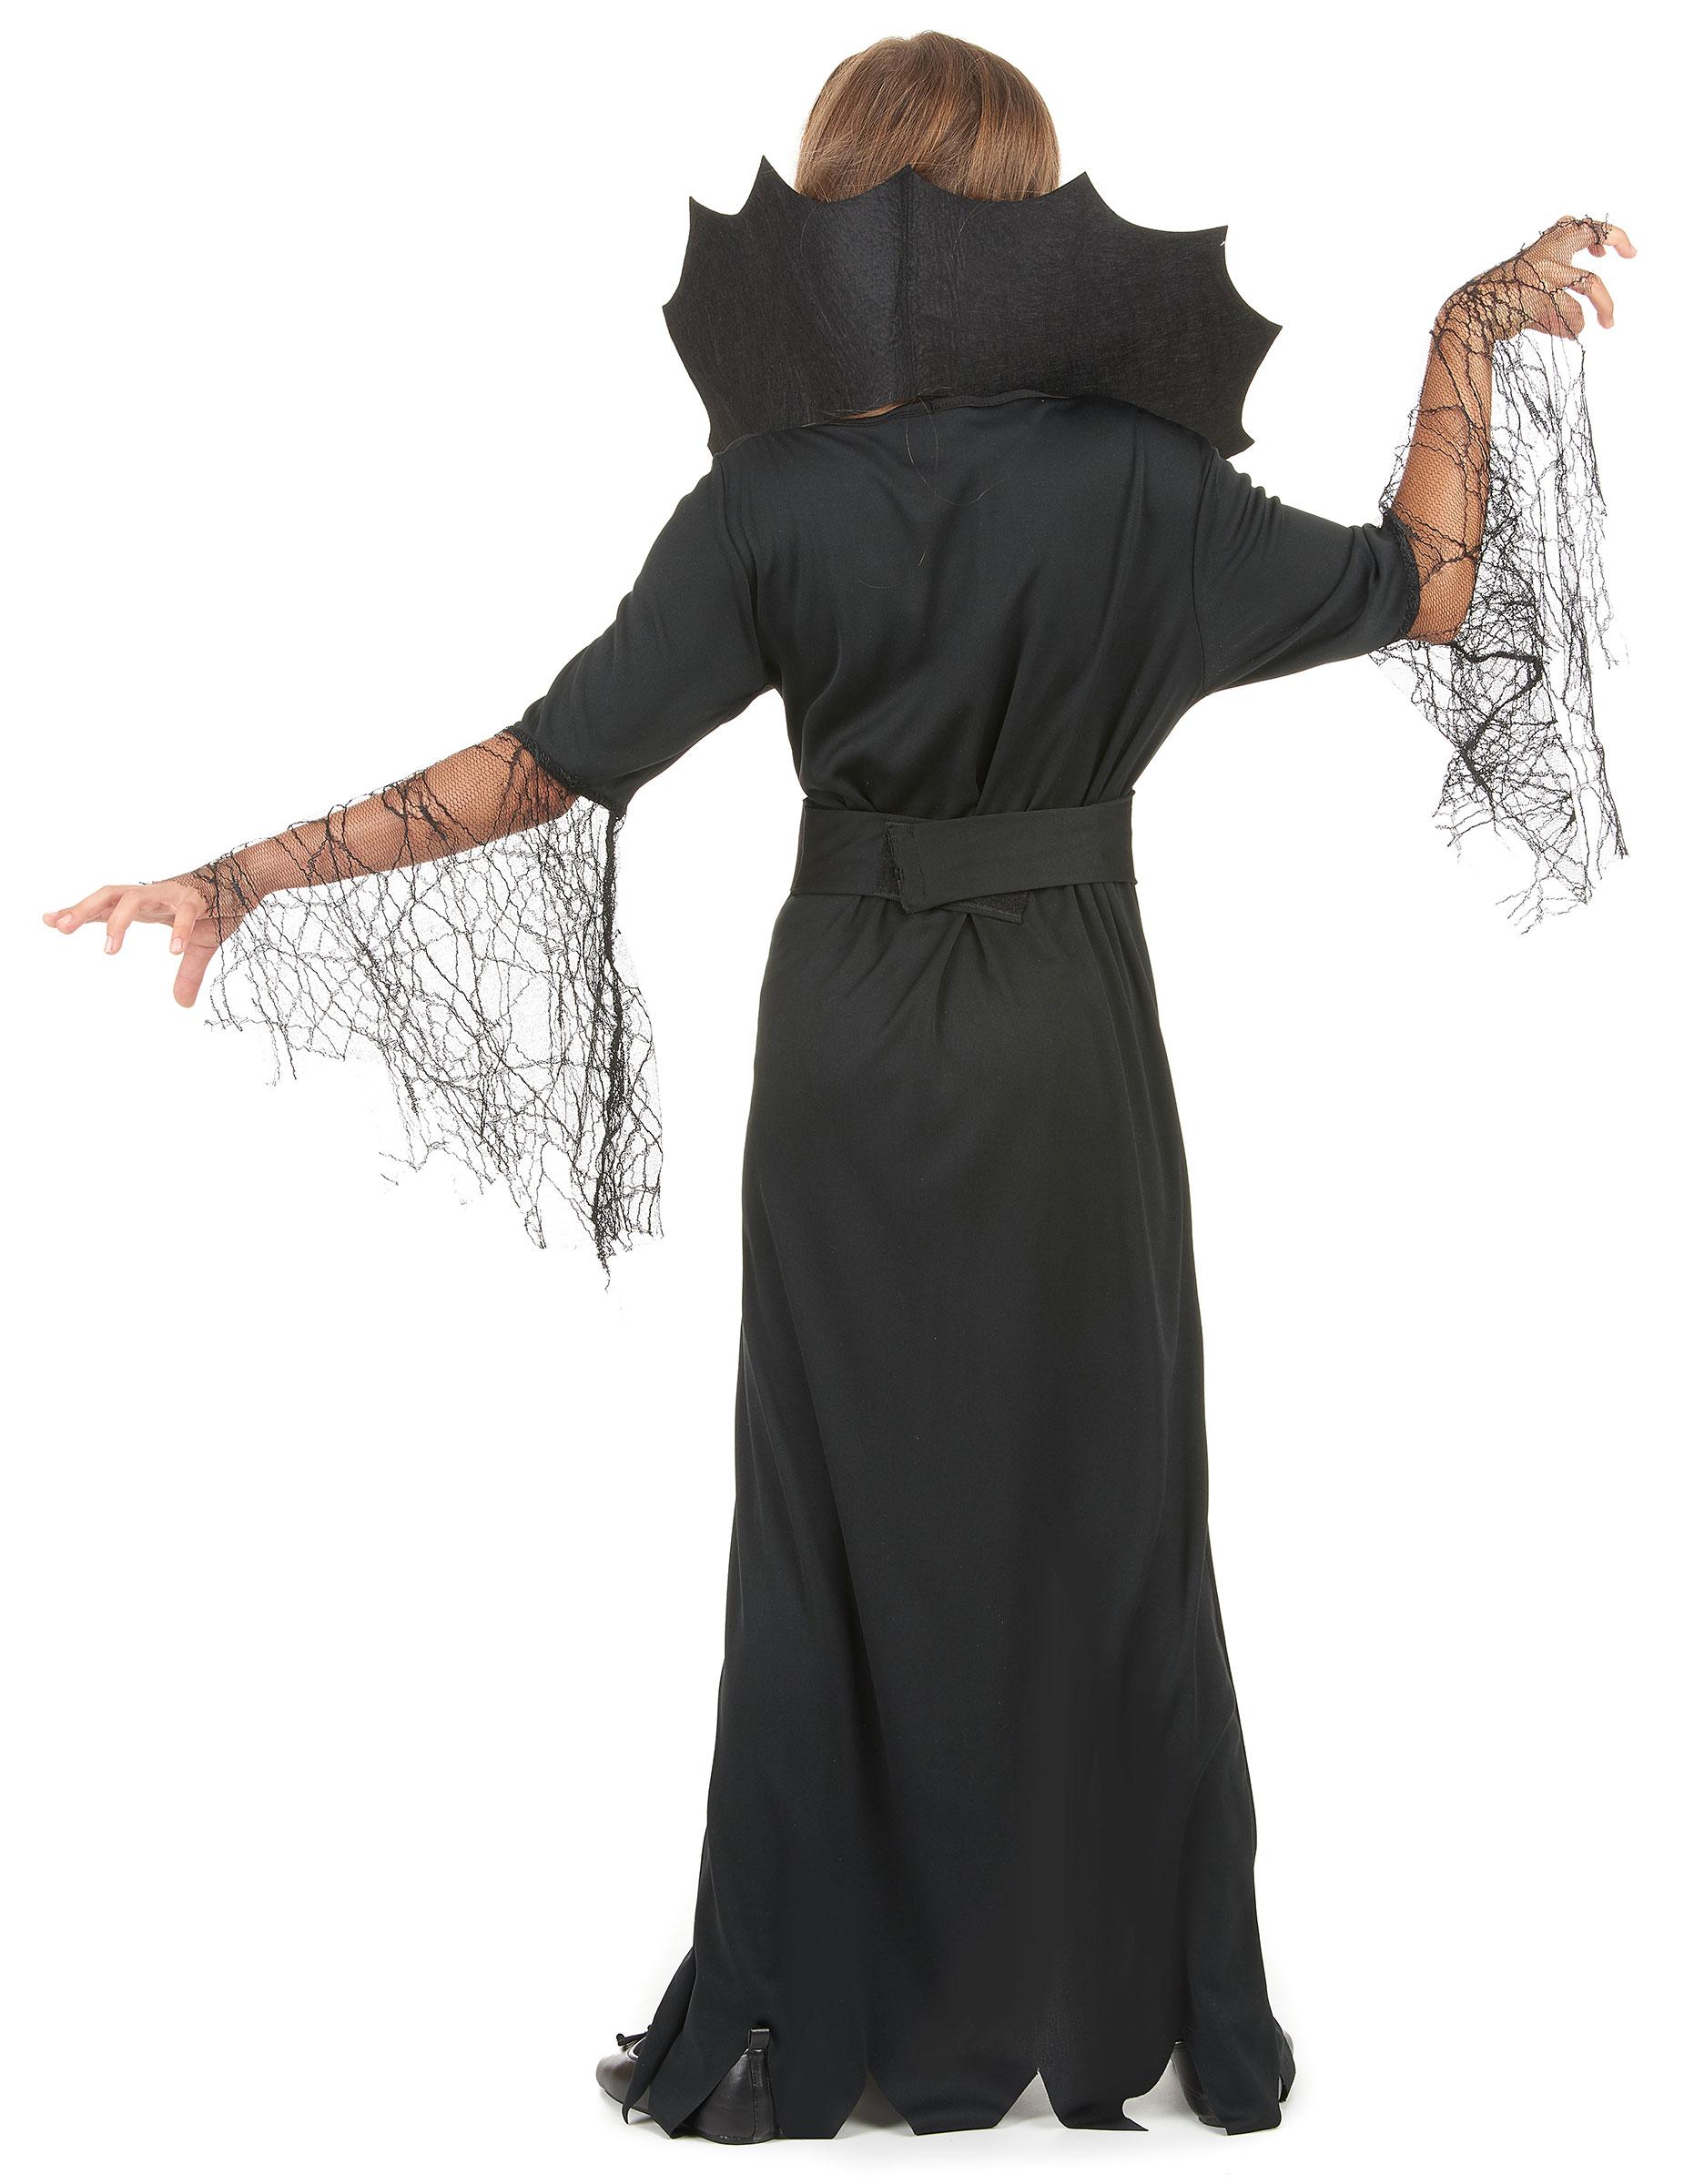 Costume da strega ragno per bambina- Halloween-2 e84edce1a46d